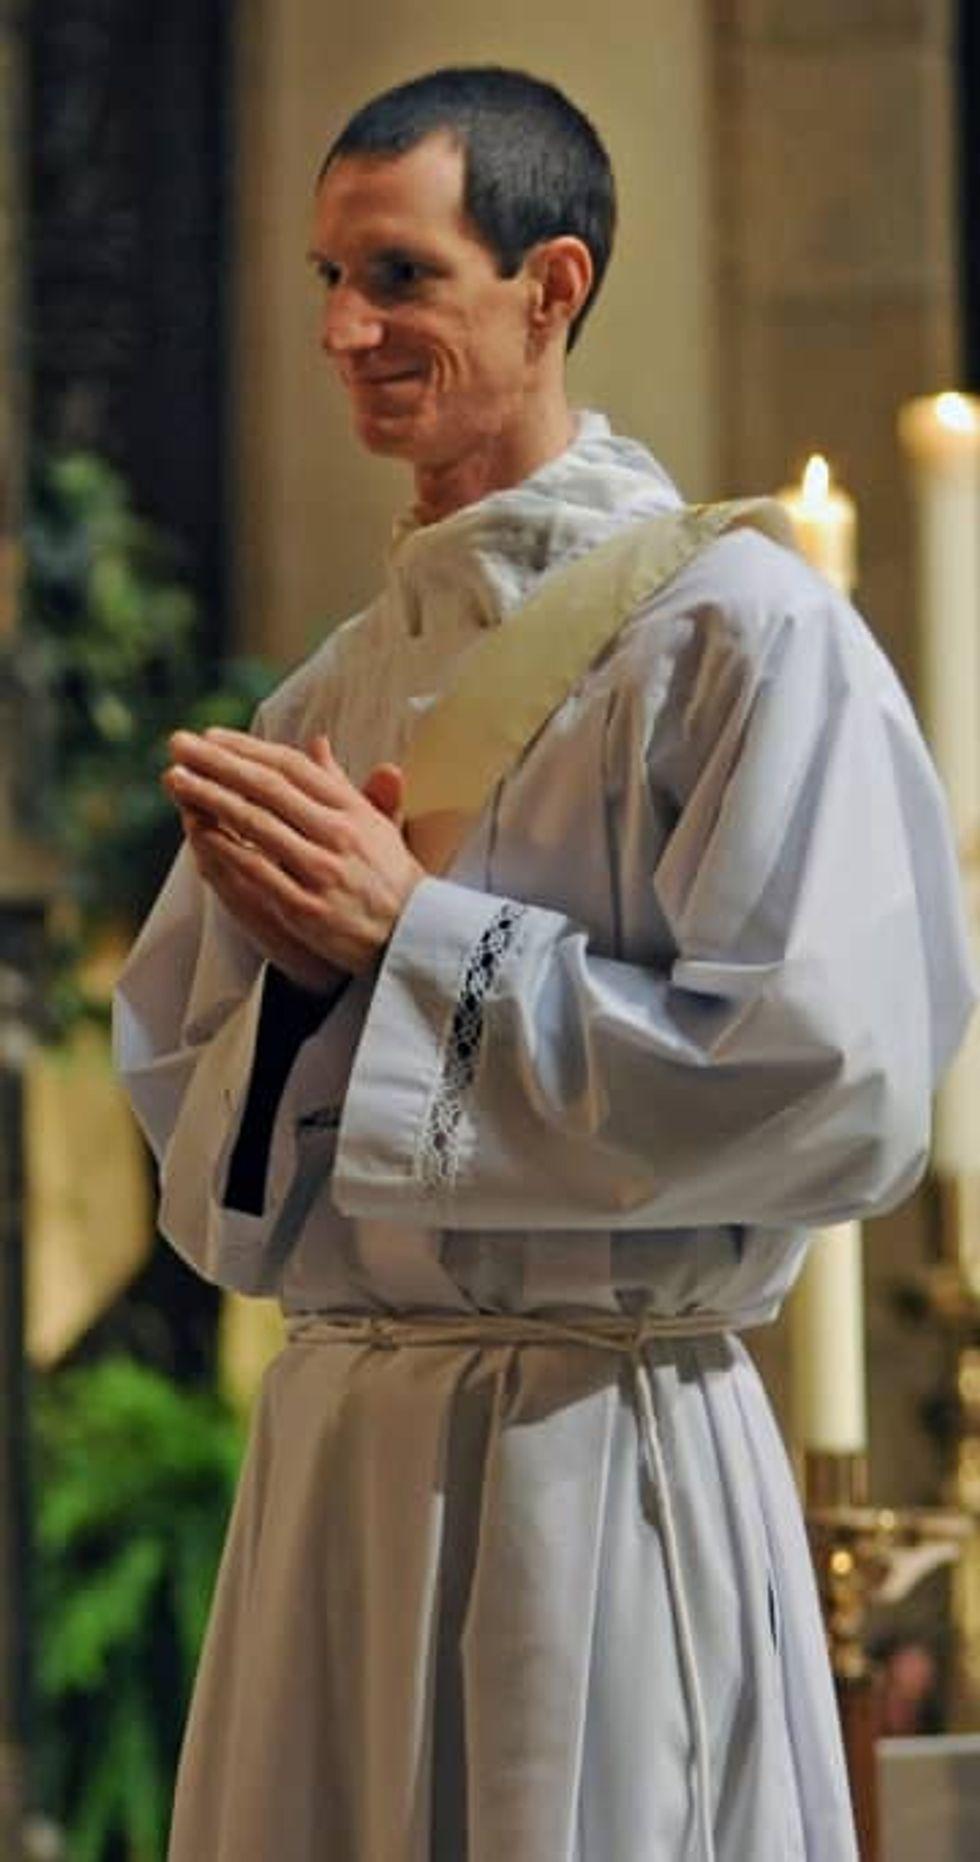 Minnesota priest apologizes for criticizing Islam in sermon